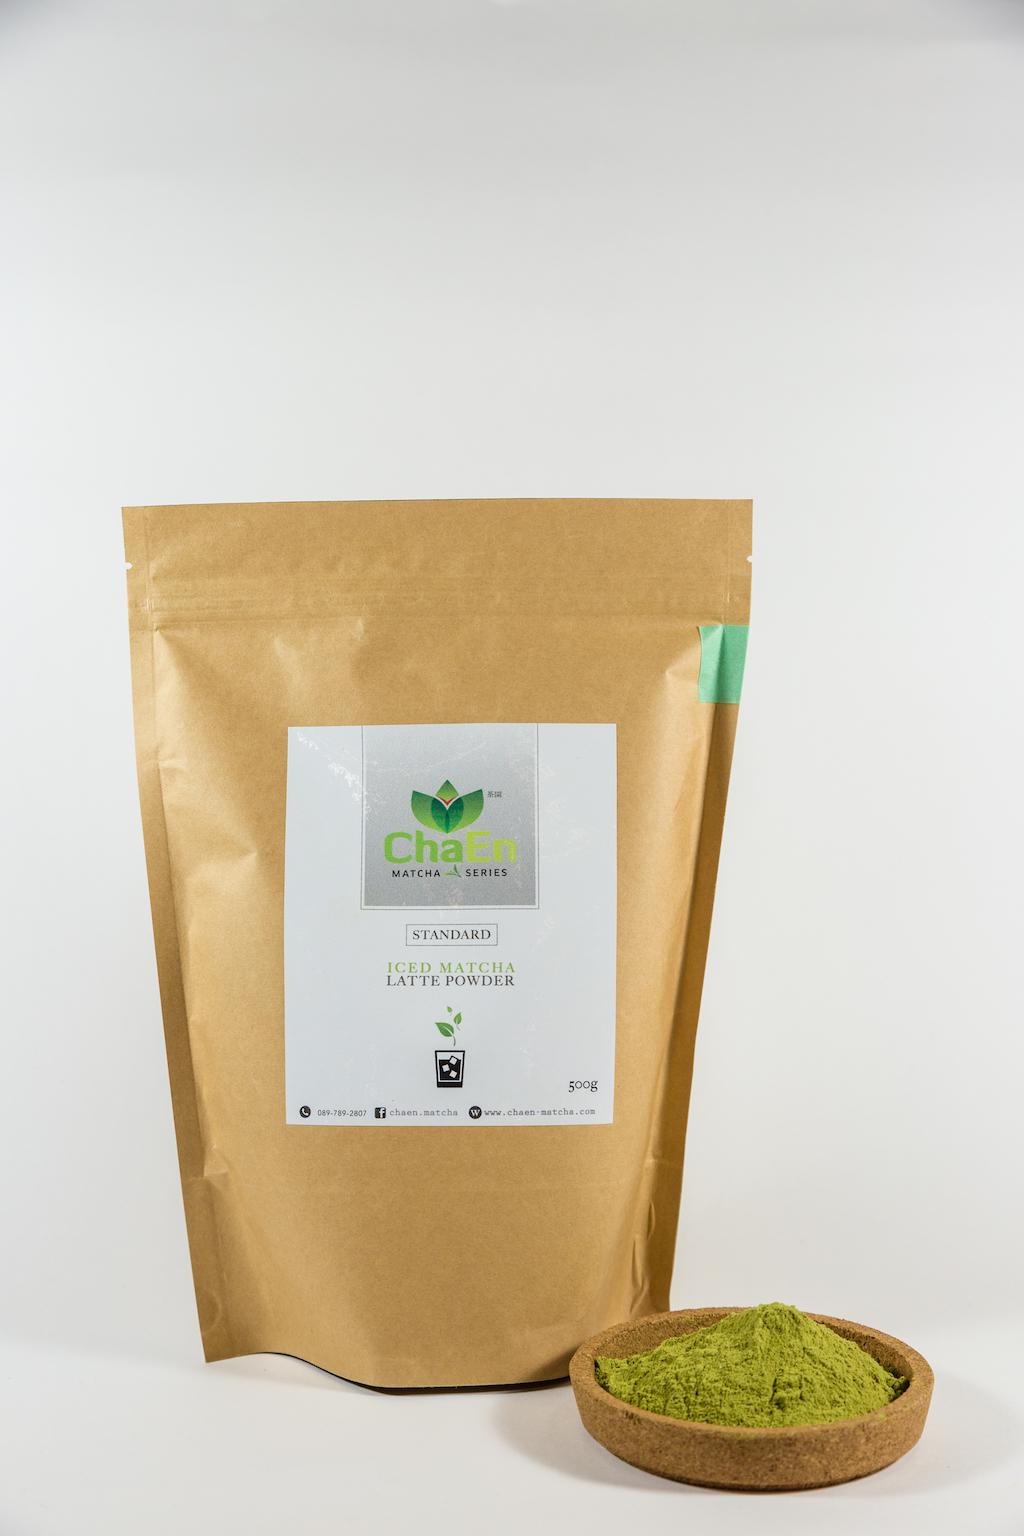 Iced Matcha Latte Powder (1kg)